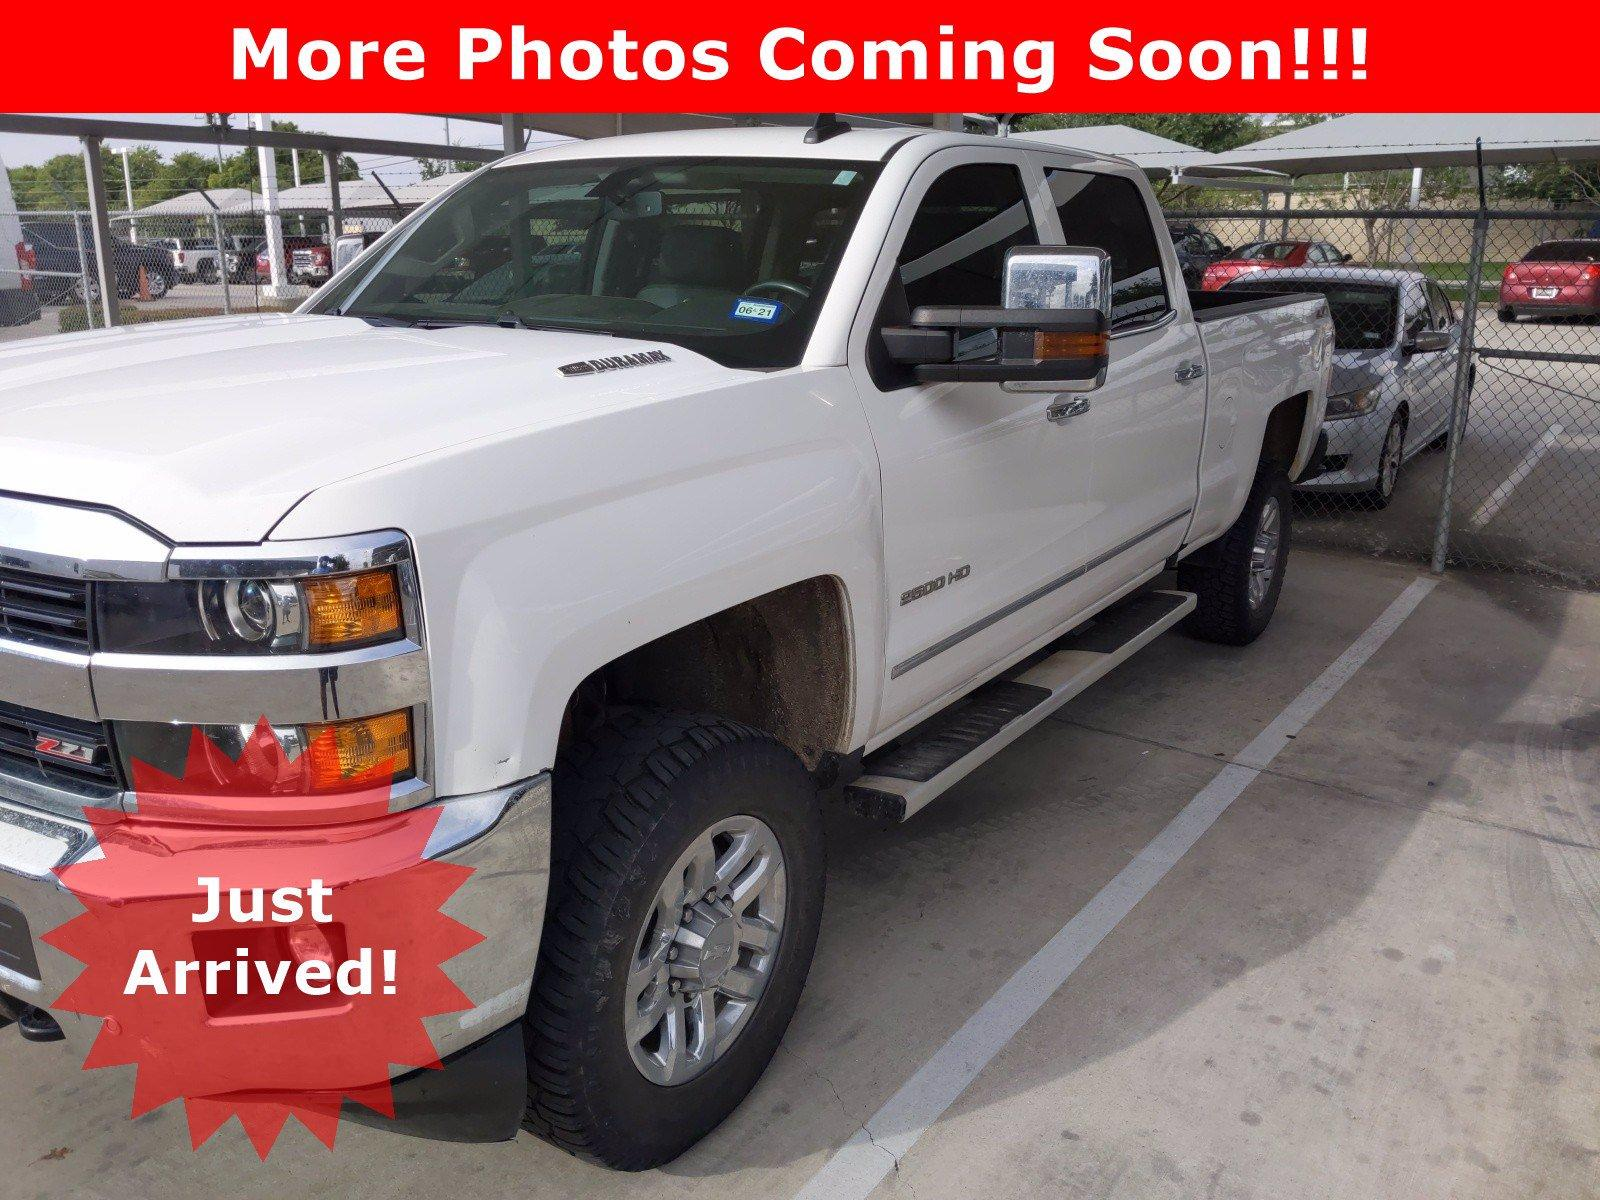 2016 Chevrolet Silverado 2500HD Vehicle Photo in SELMA, TX 78154-1459